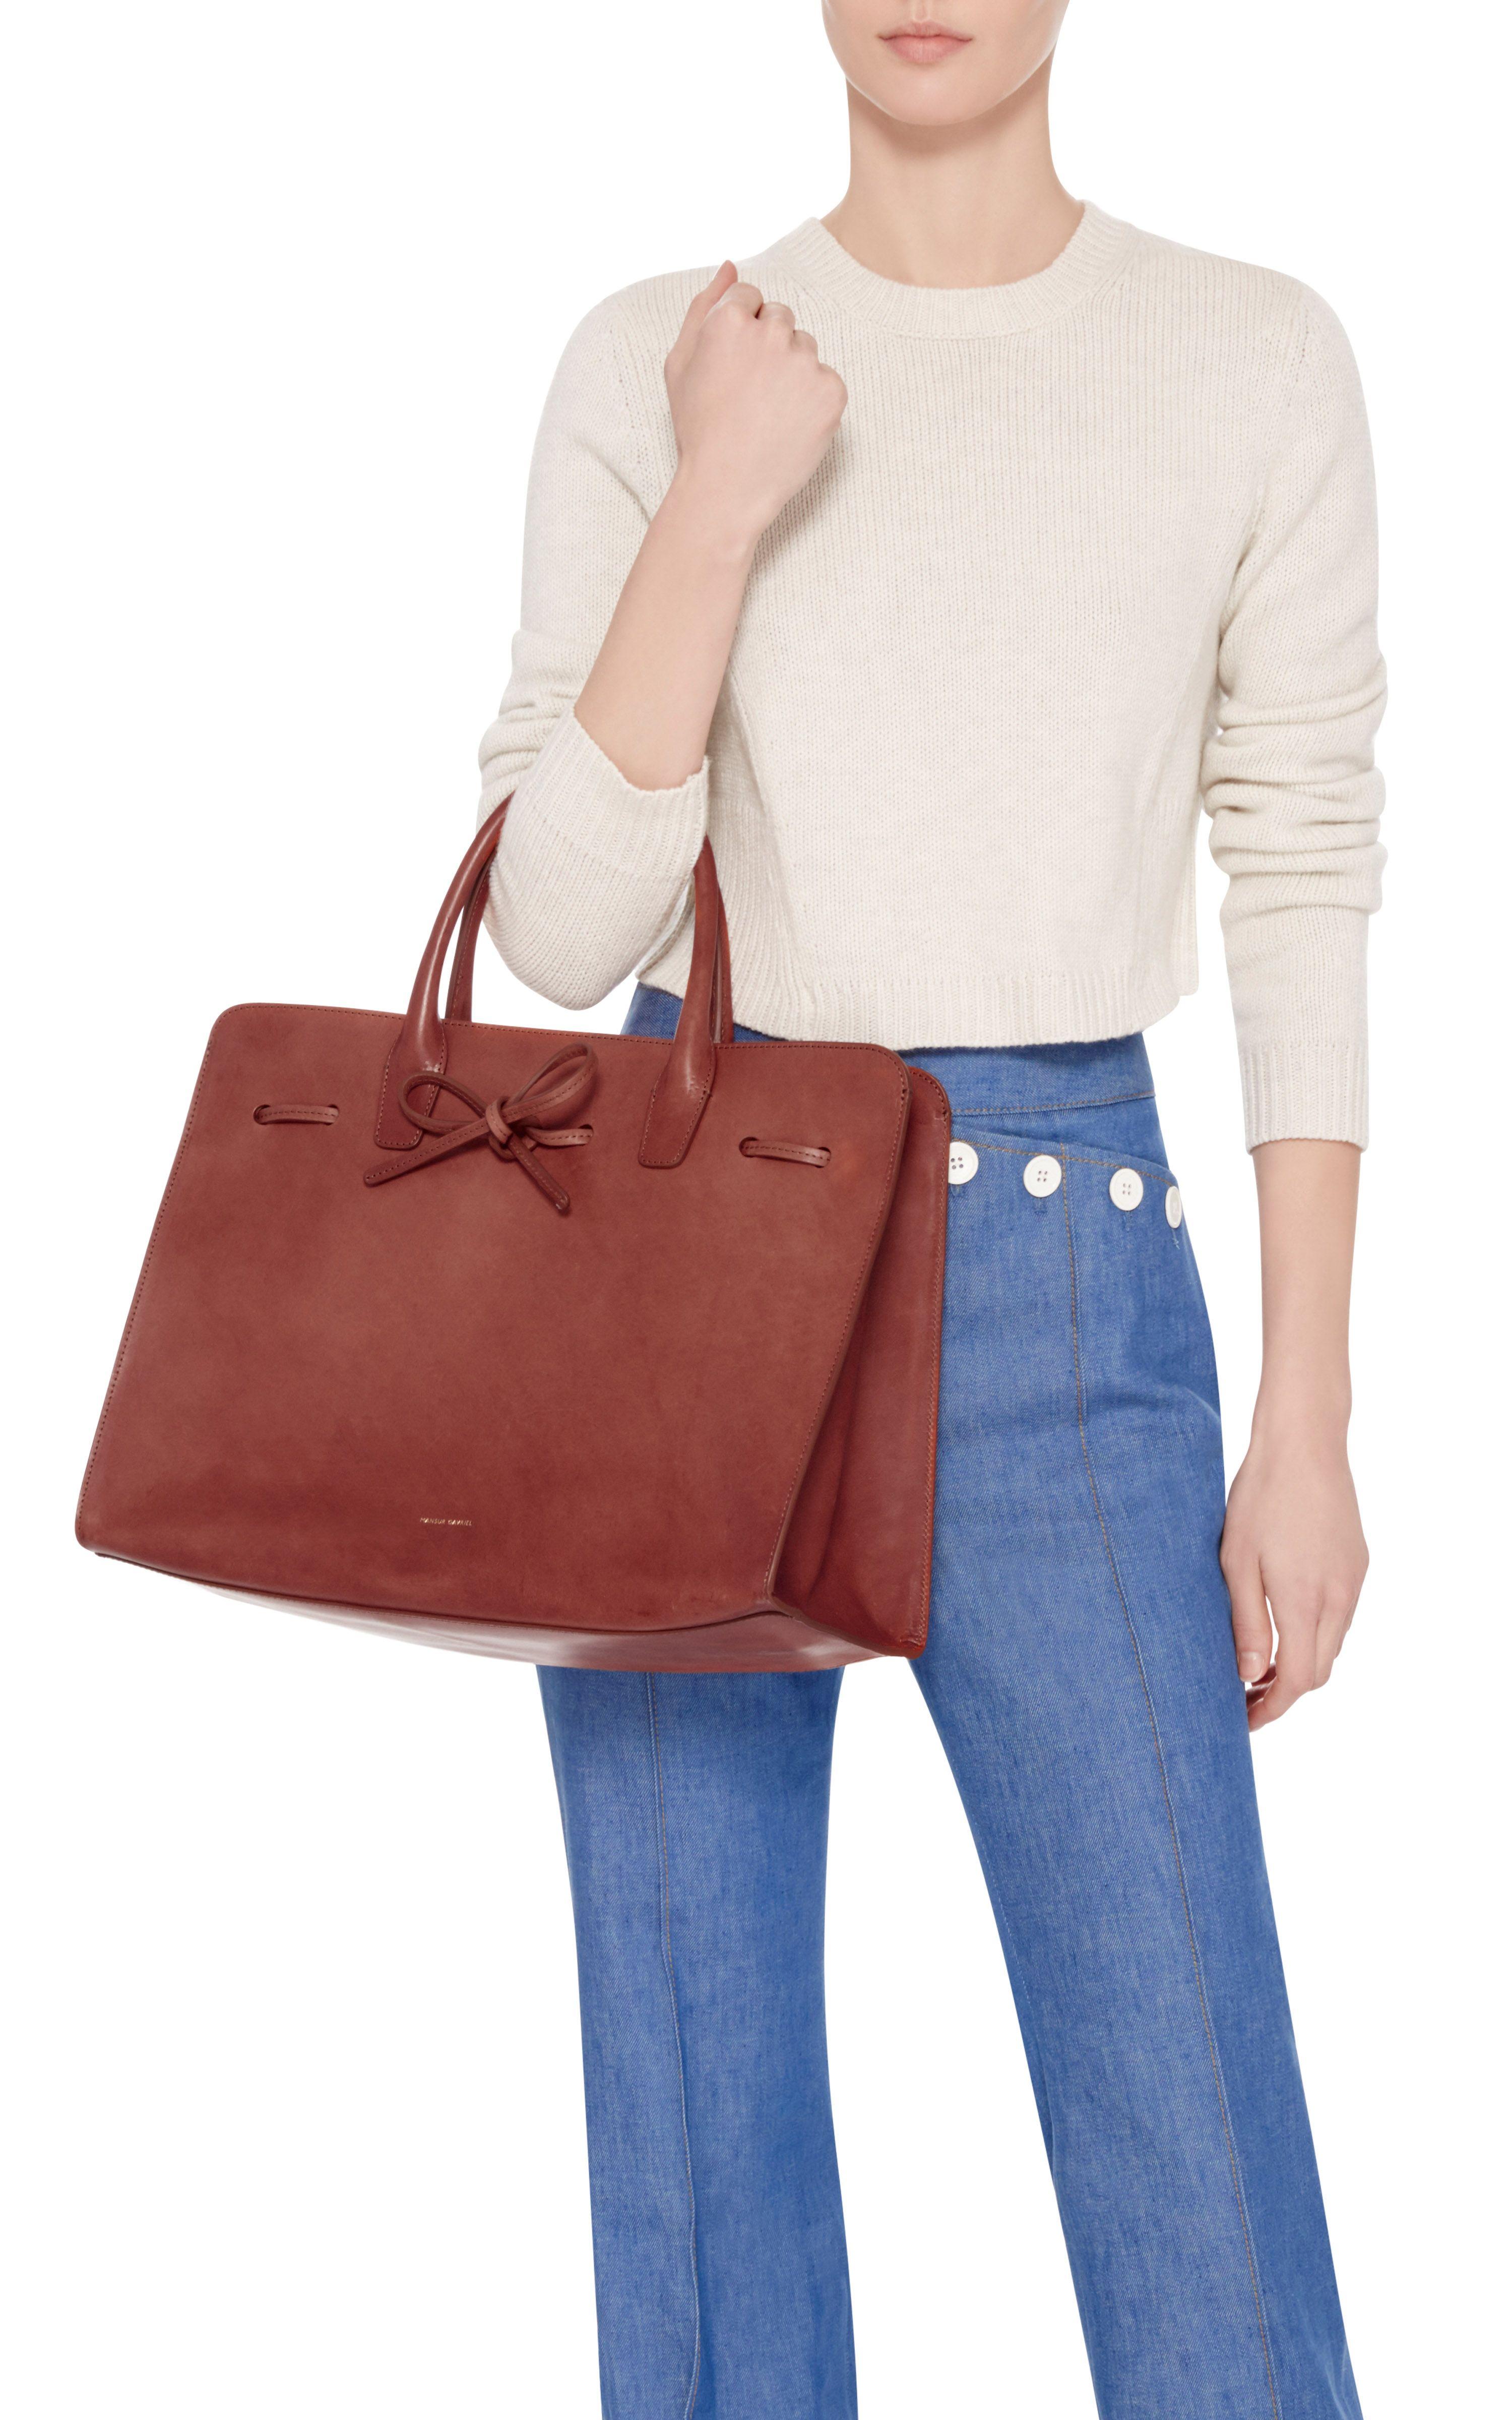 7cbf6b3840afc Mansur Gavriel Fall Winter 2016 - Large Sun Bag in vegetable tanned leather  - pre-order now on Moda Operandi